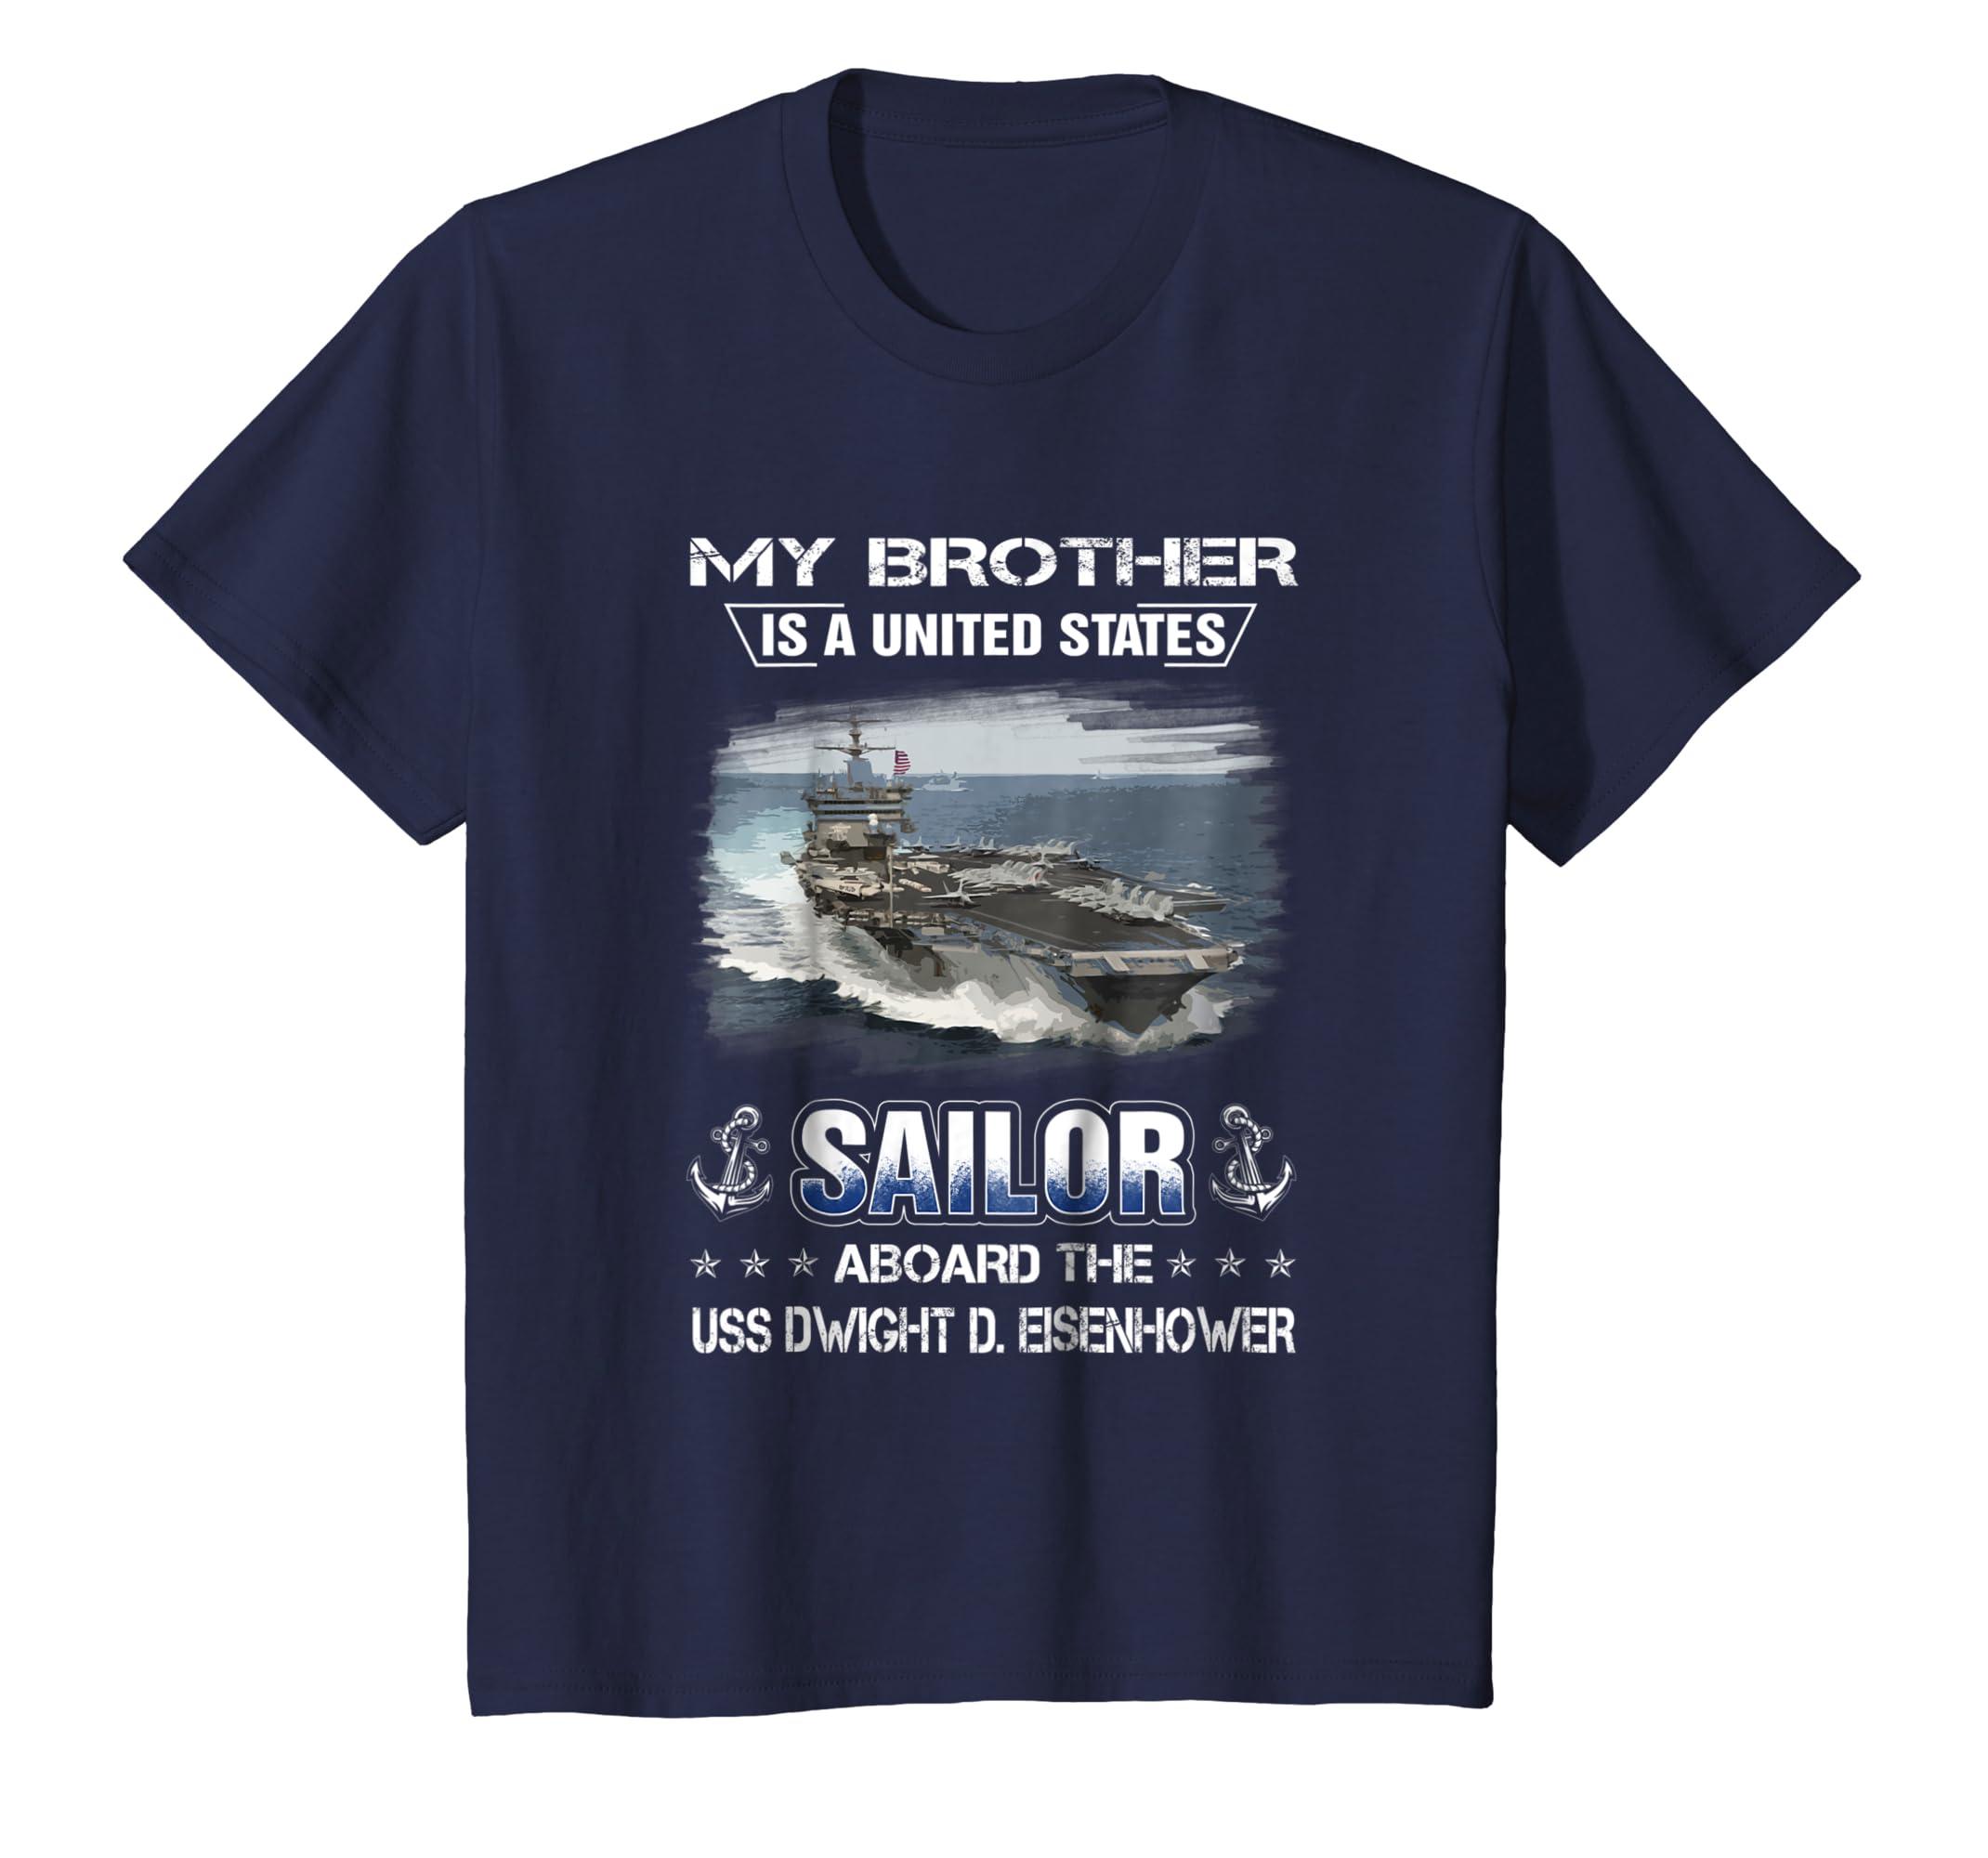 d4b94f57d59a8 Amazon.com  My Brother Is a Sailor Aboard USS Dwight D. Eisenhower Shirt   Clothing